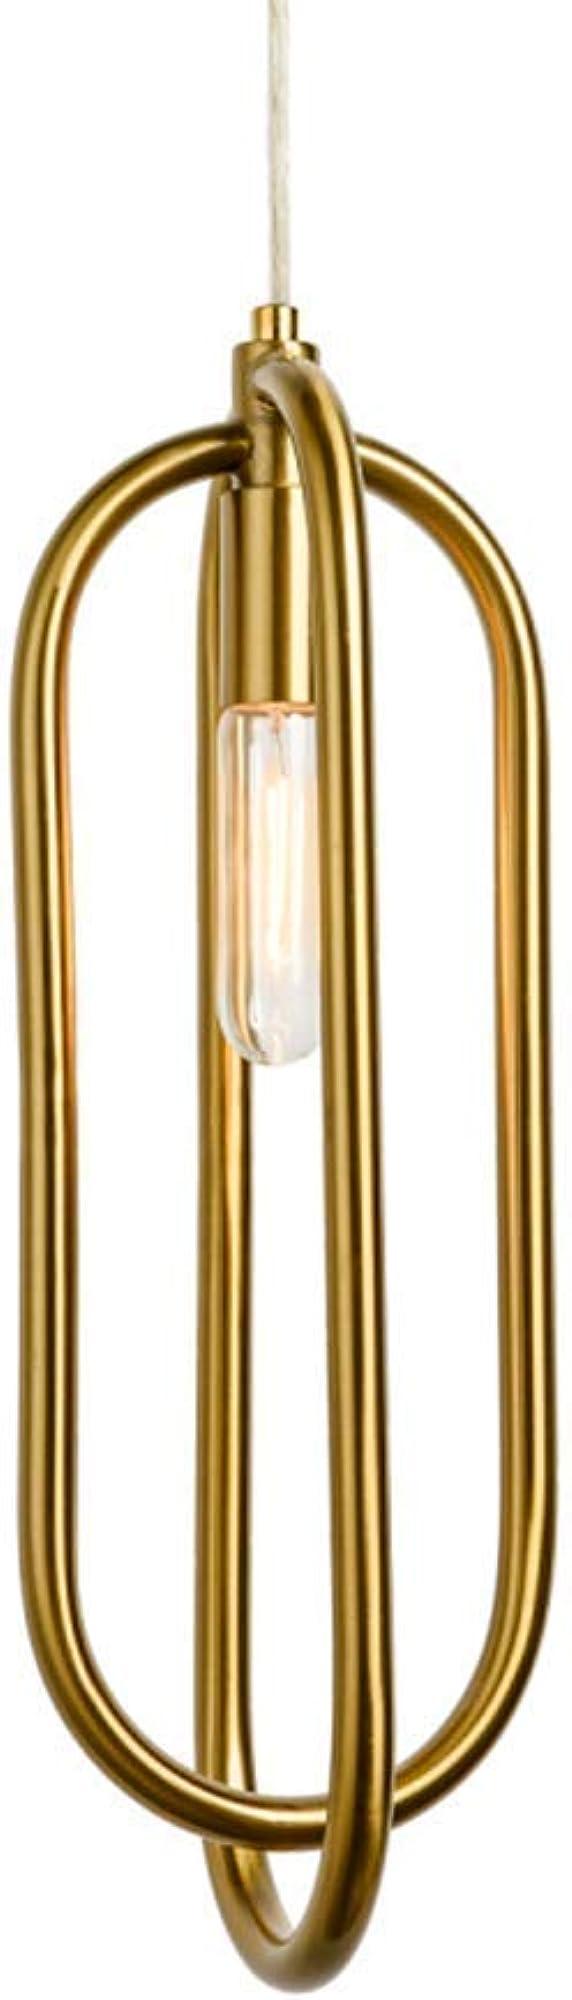 Xajgw lampadario moderno in metallo